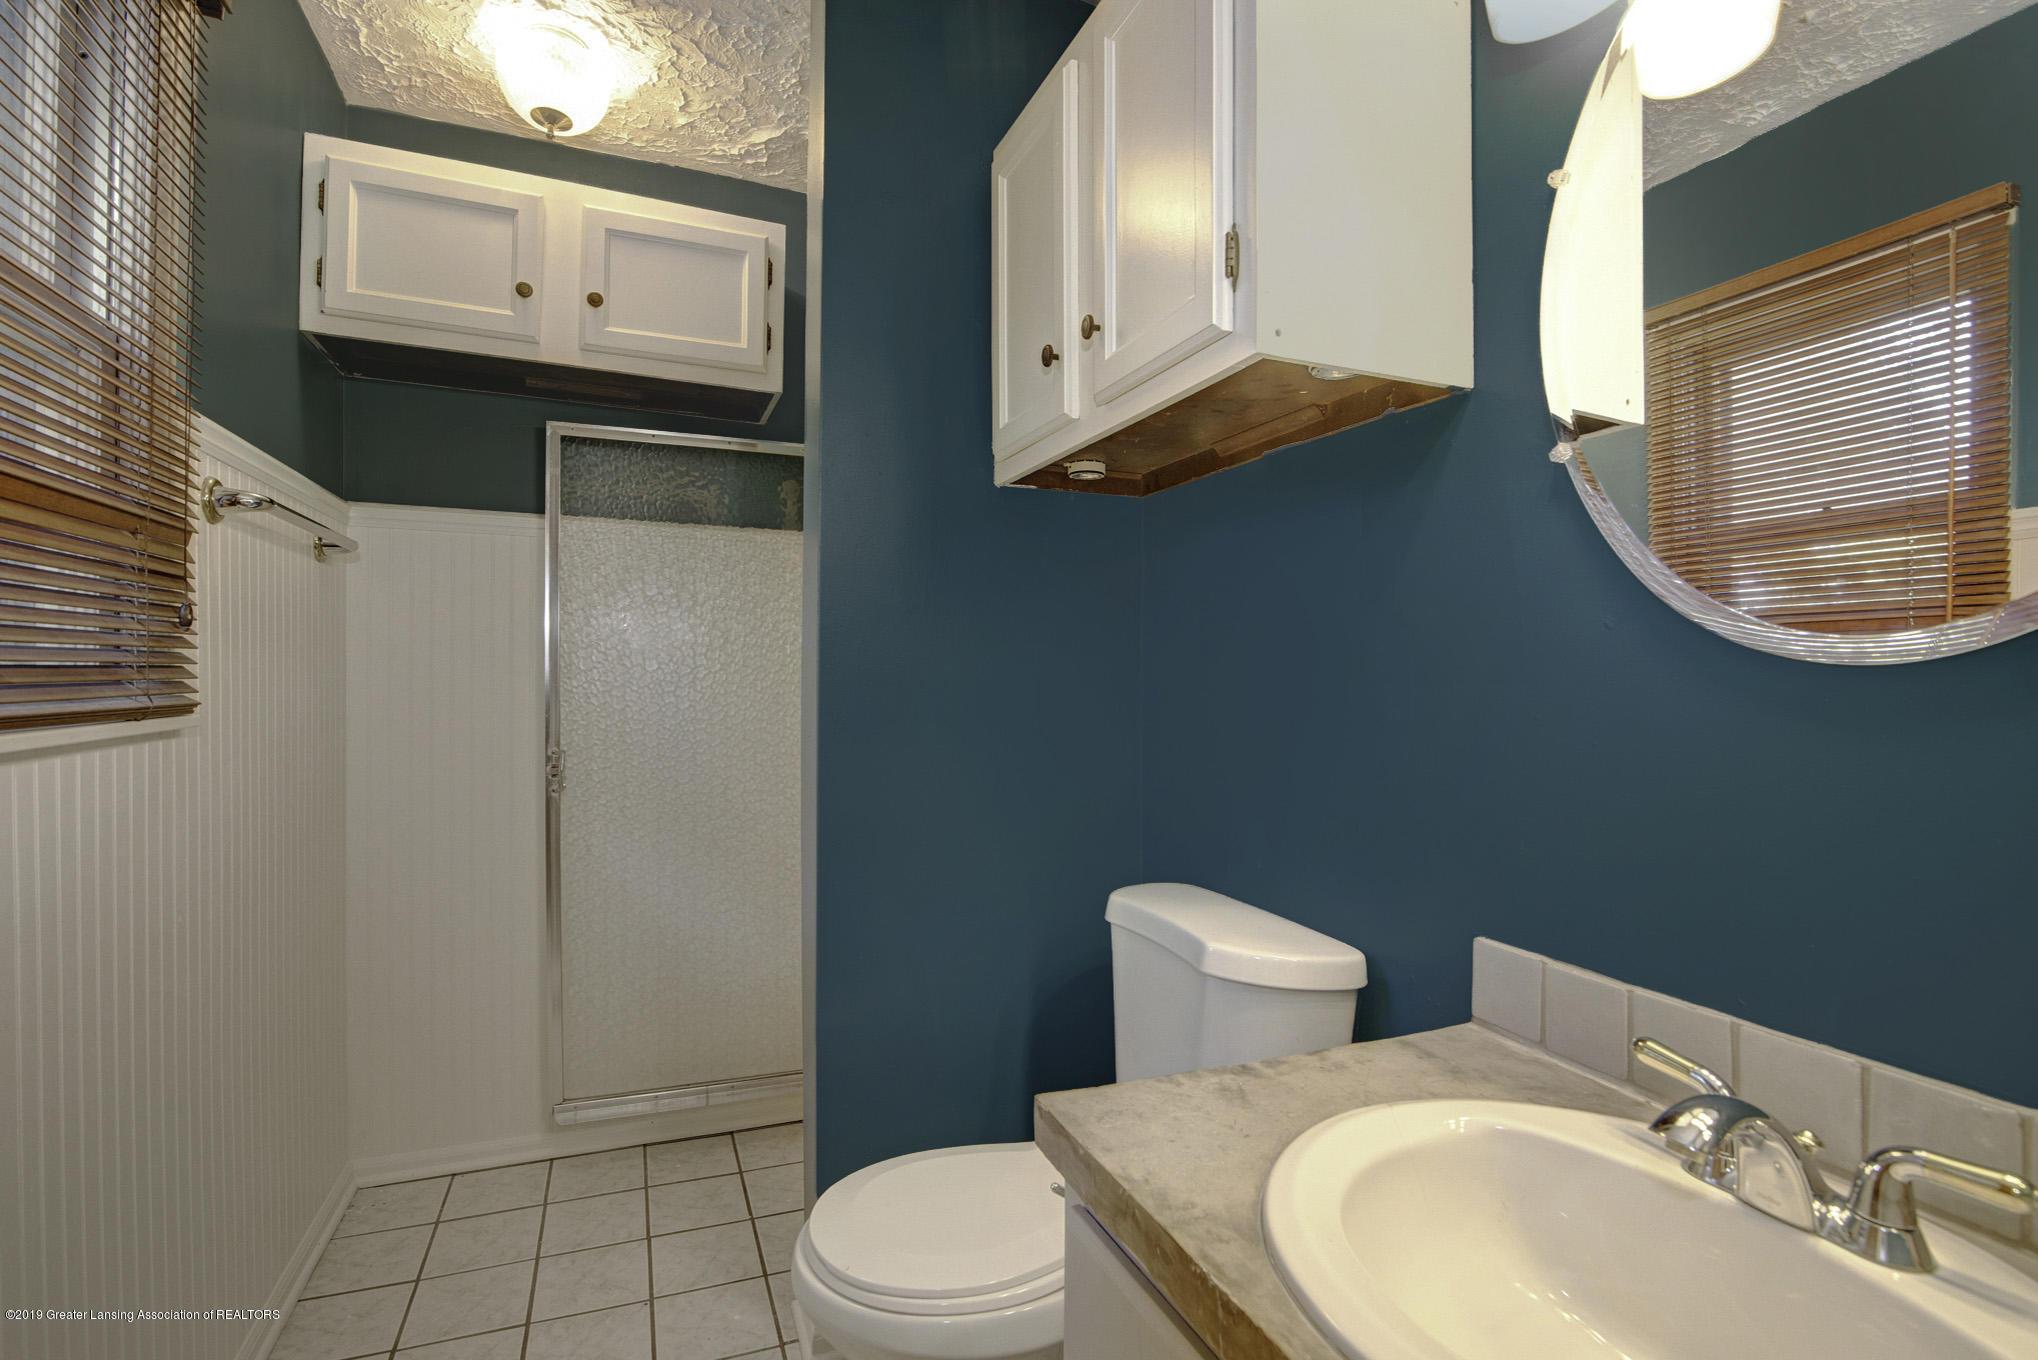 1417 Spearberry Ln - Bathroom - 18